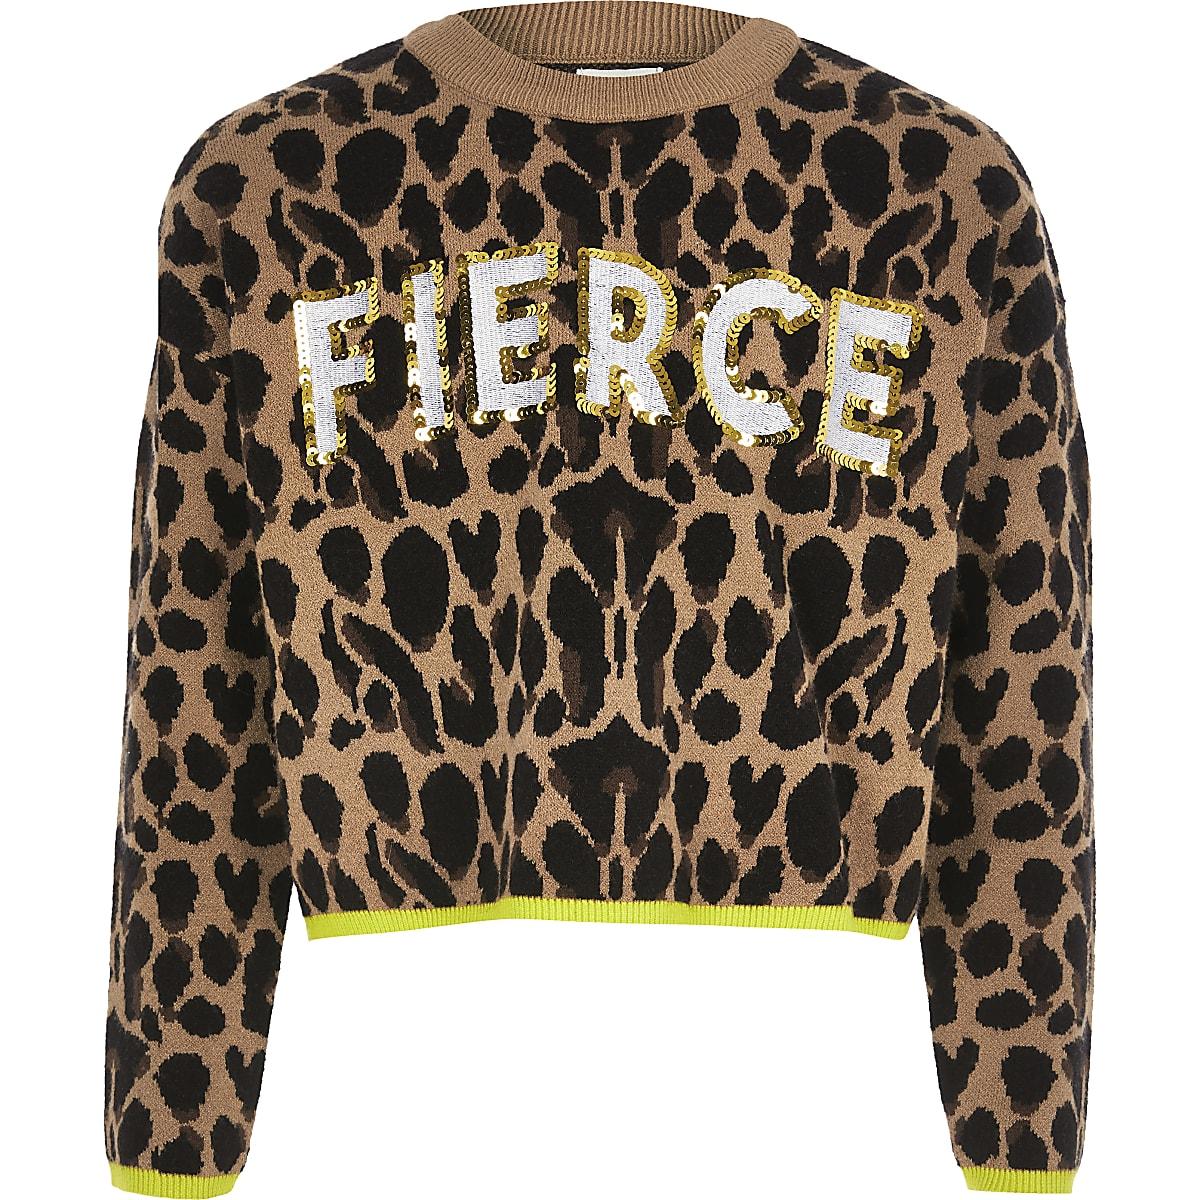 Bruine pullover met luipaardprint en 'fierce'-tekst voor meisjes